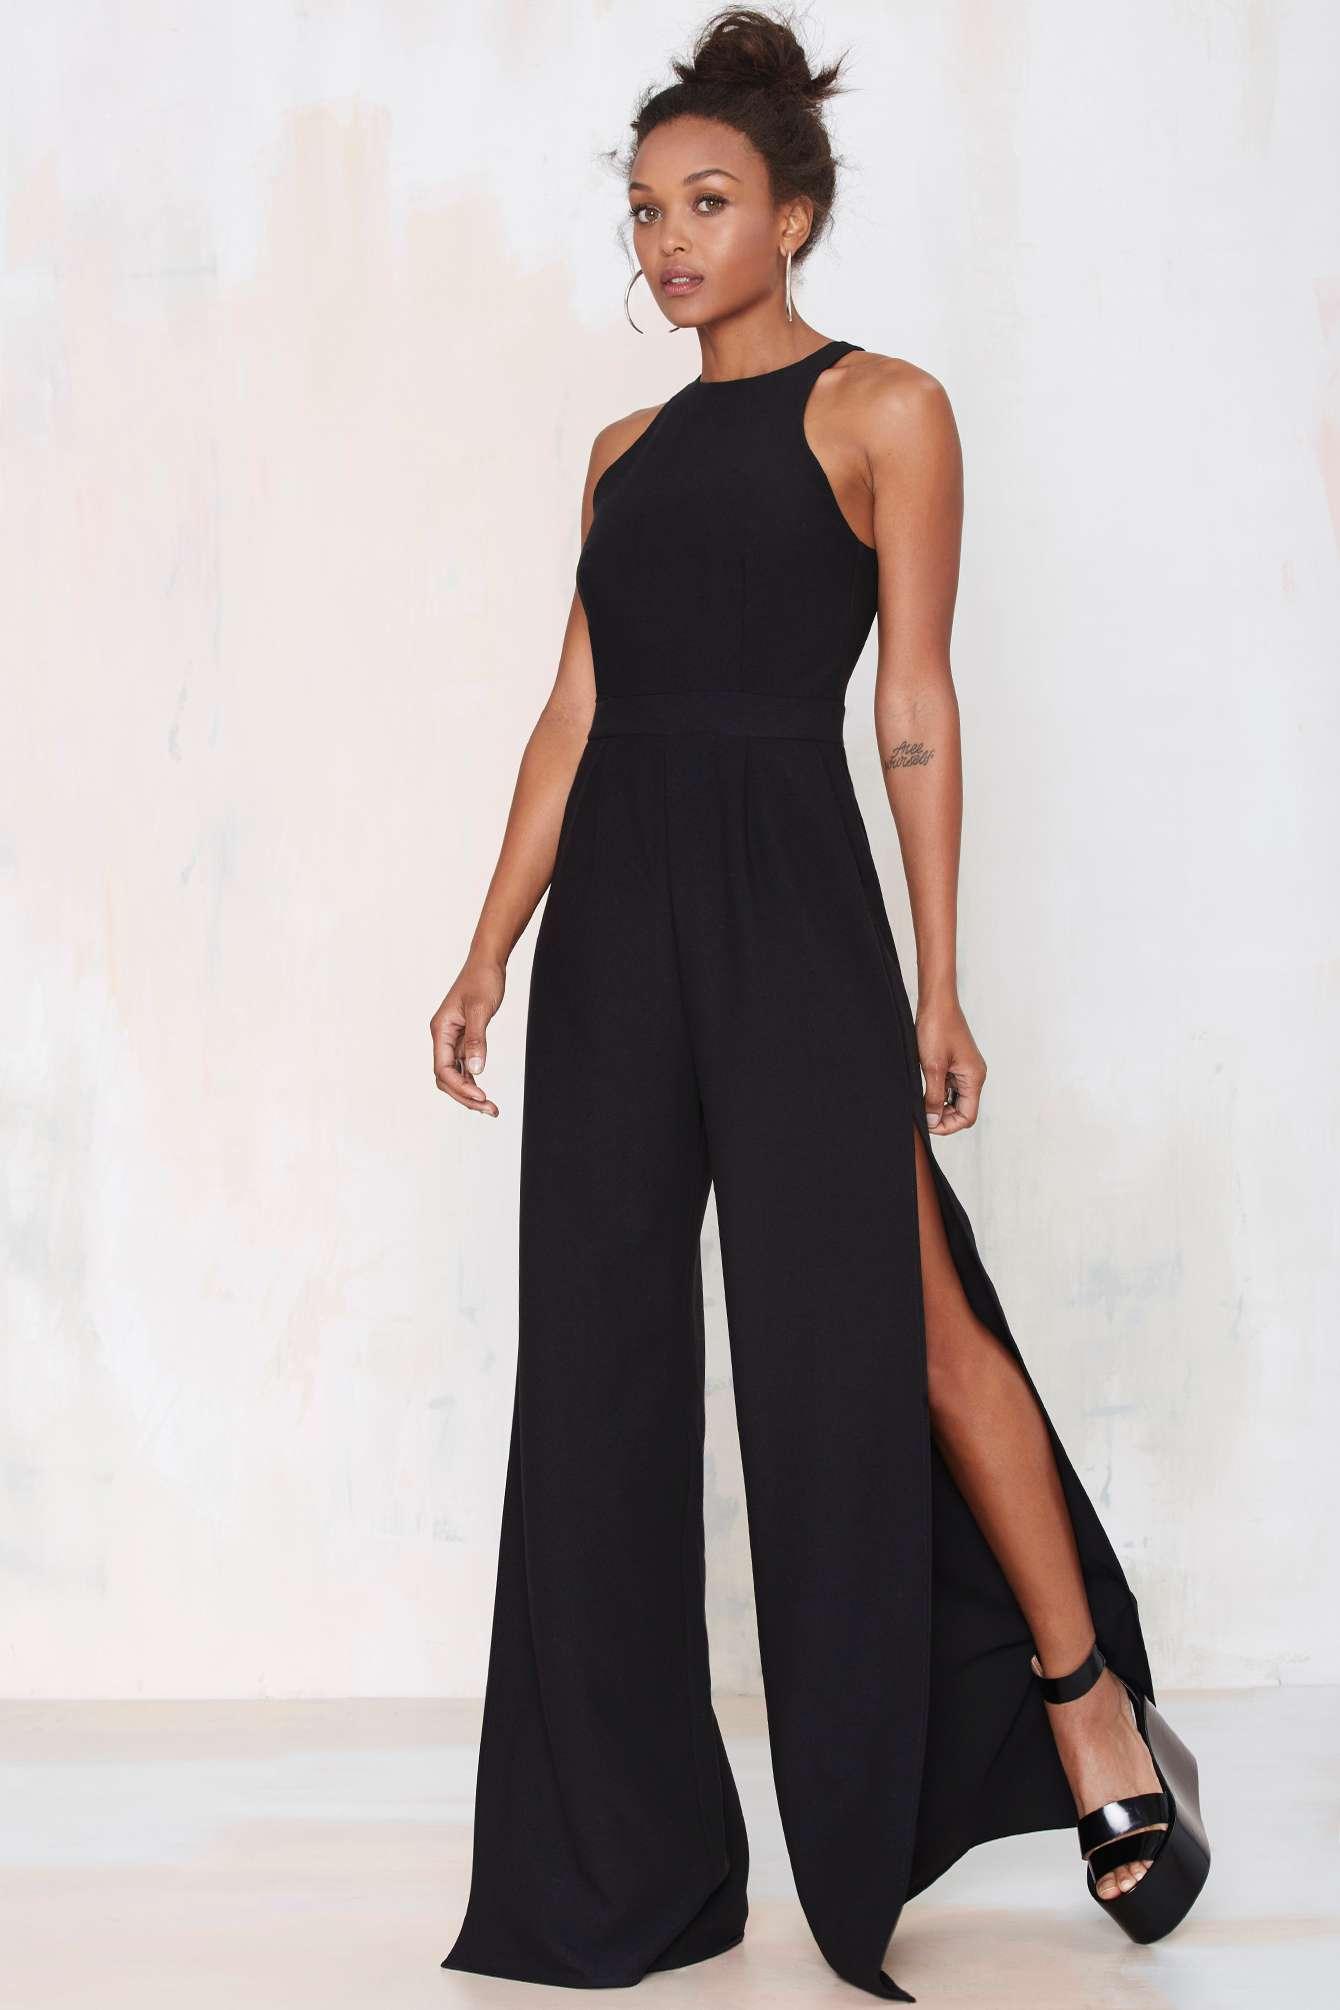 neiman marcus dresses prom – Fashion dresses